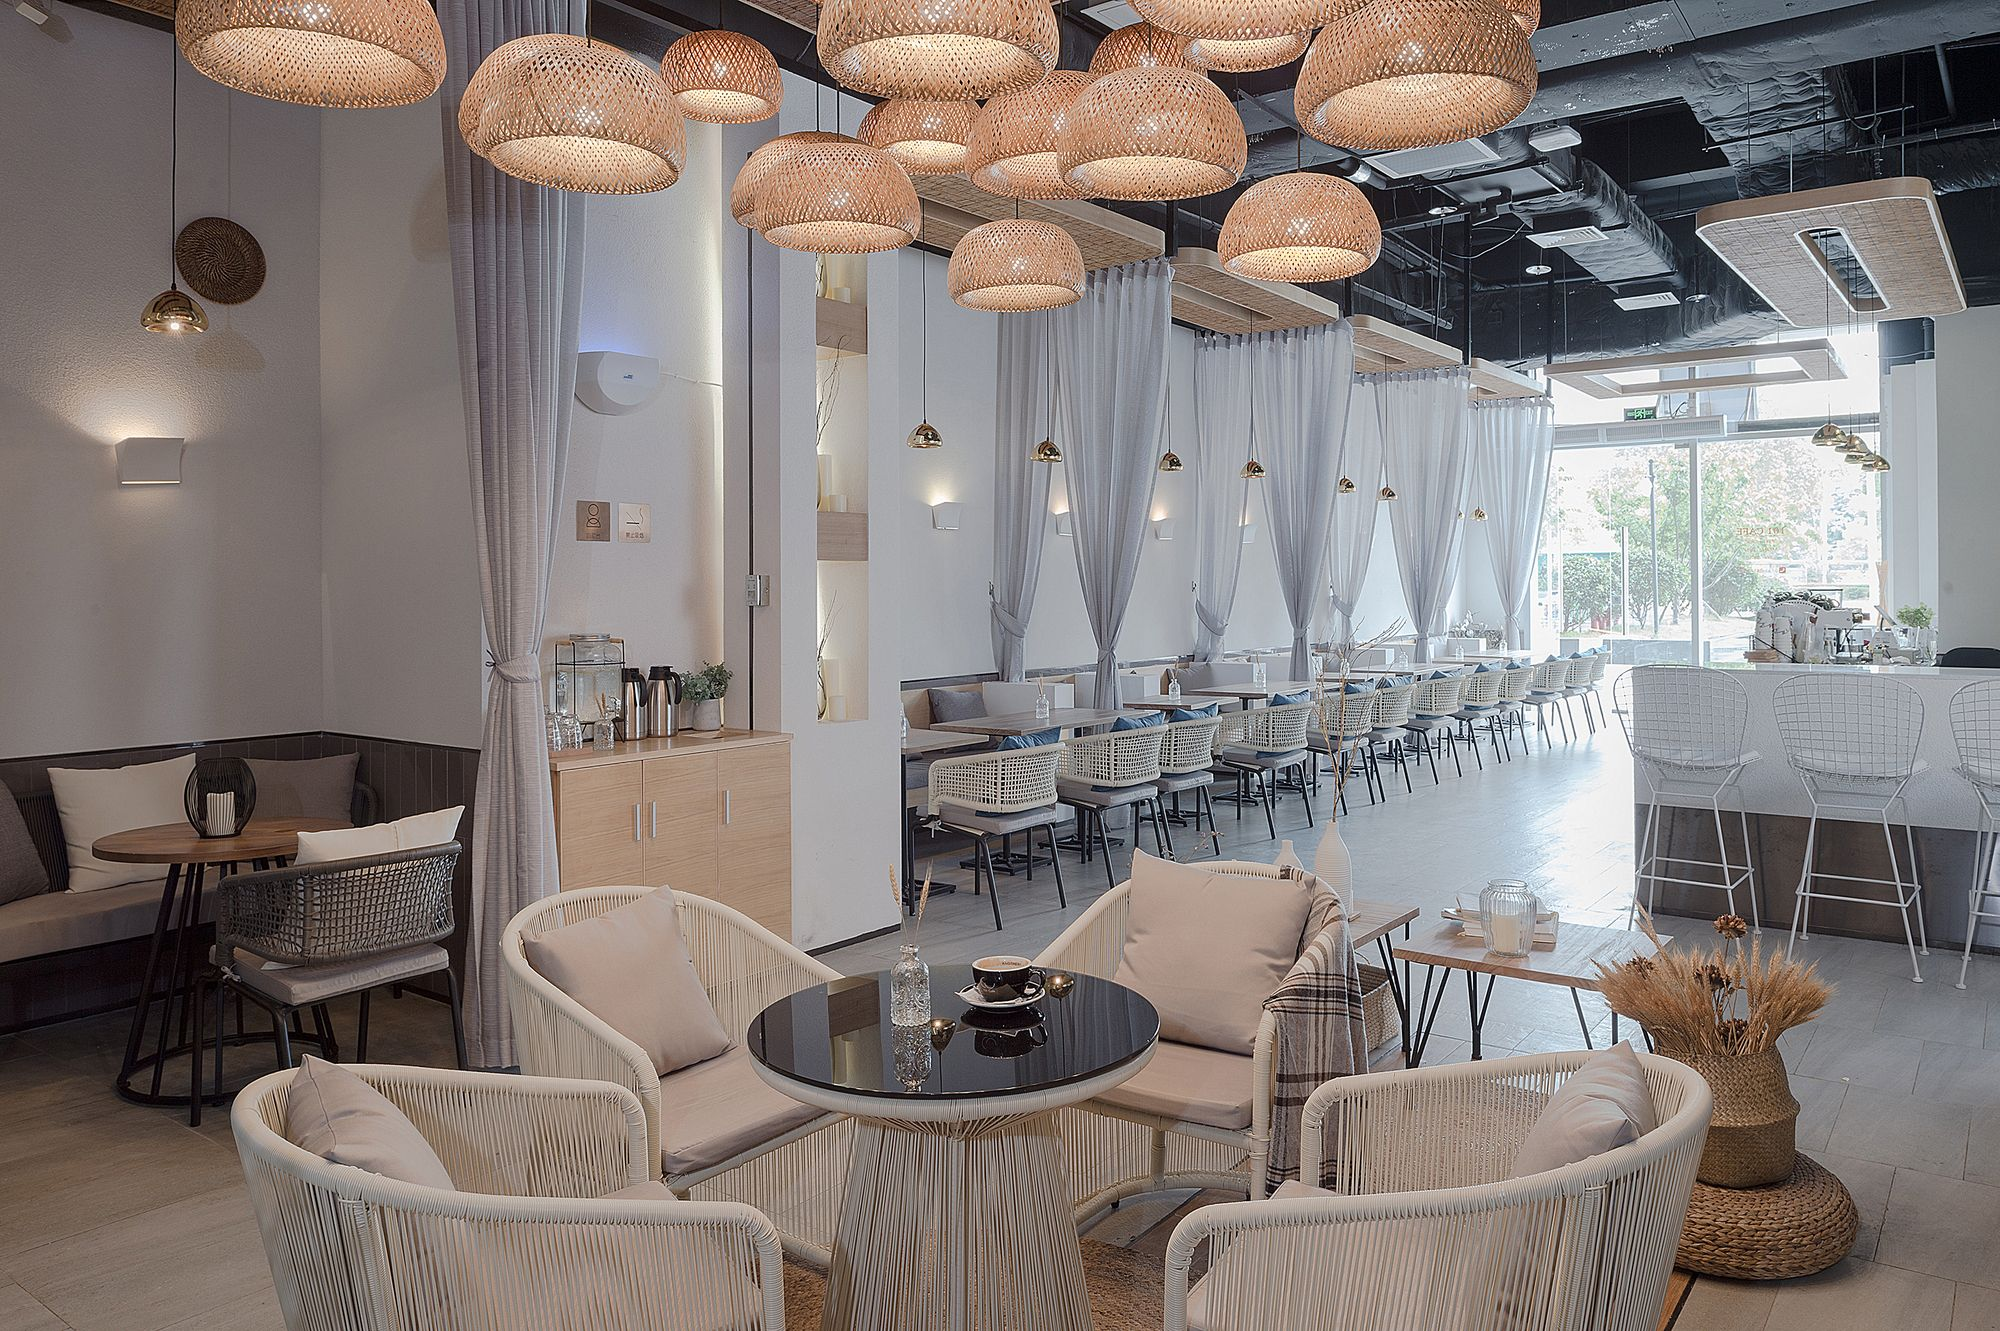 Gallery of 101 café FAR OFFICE 2